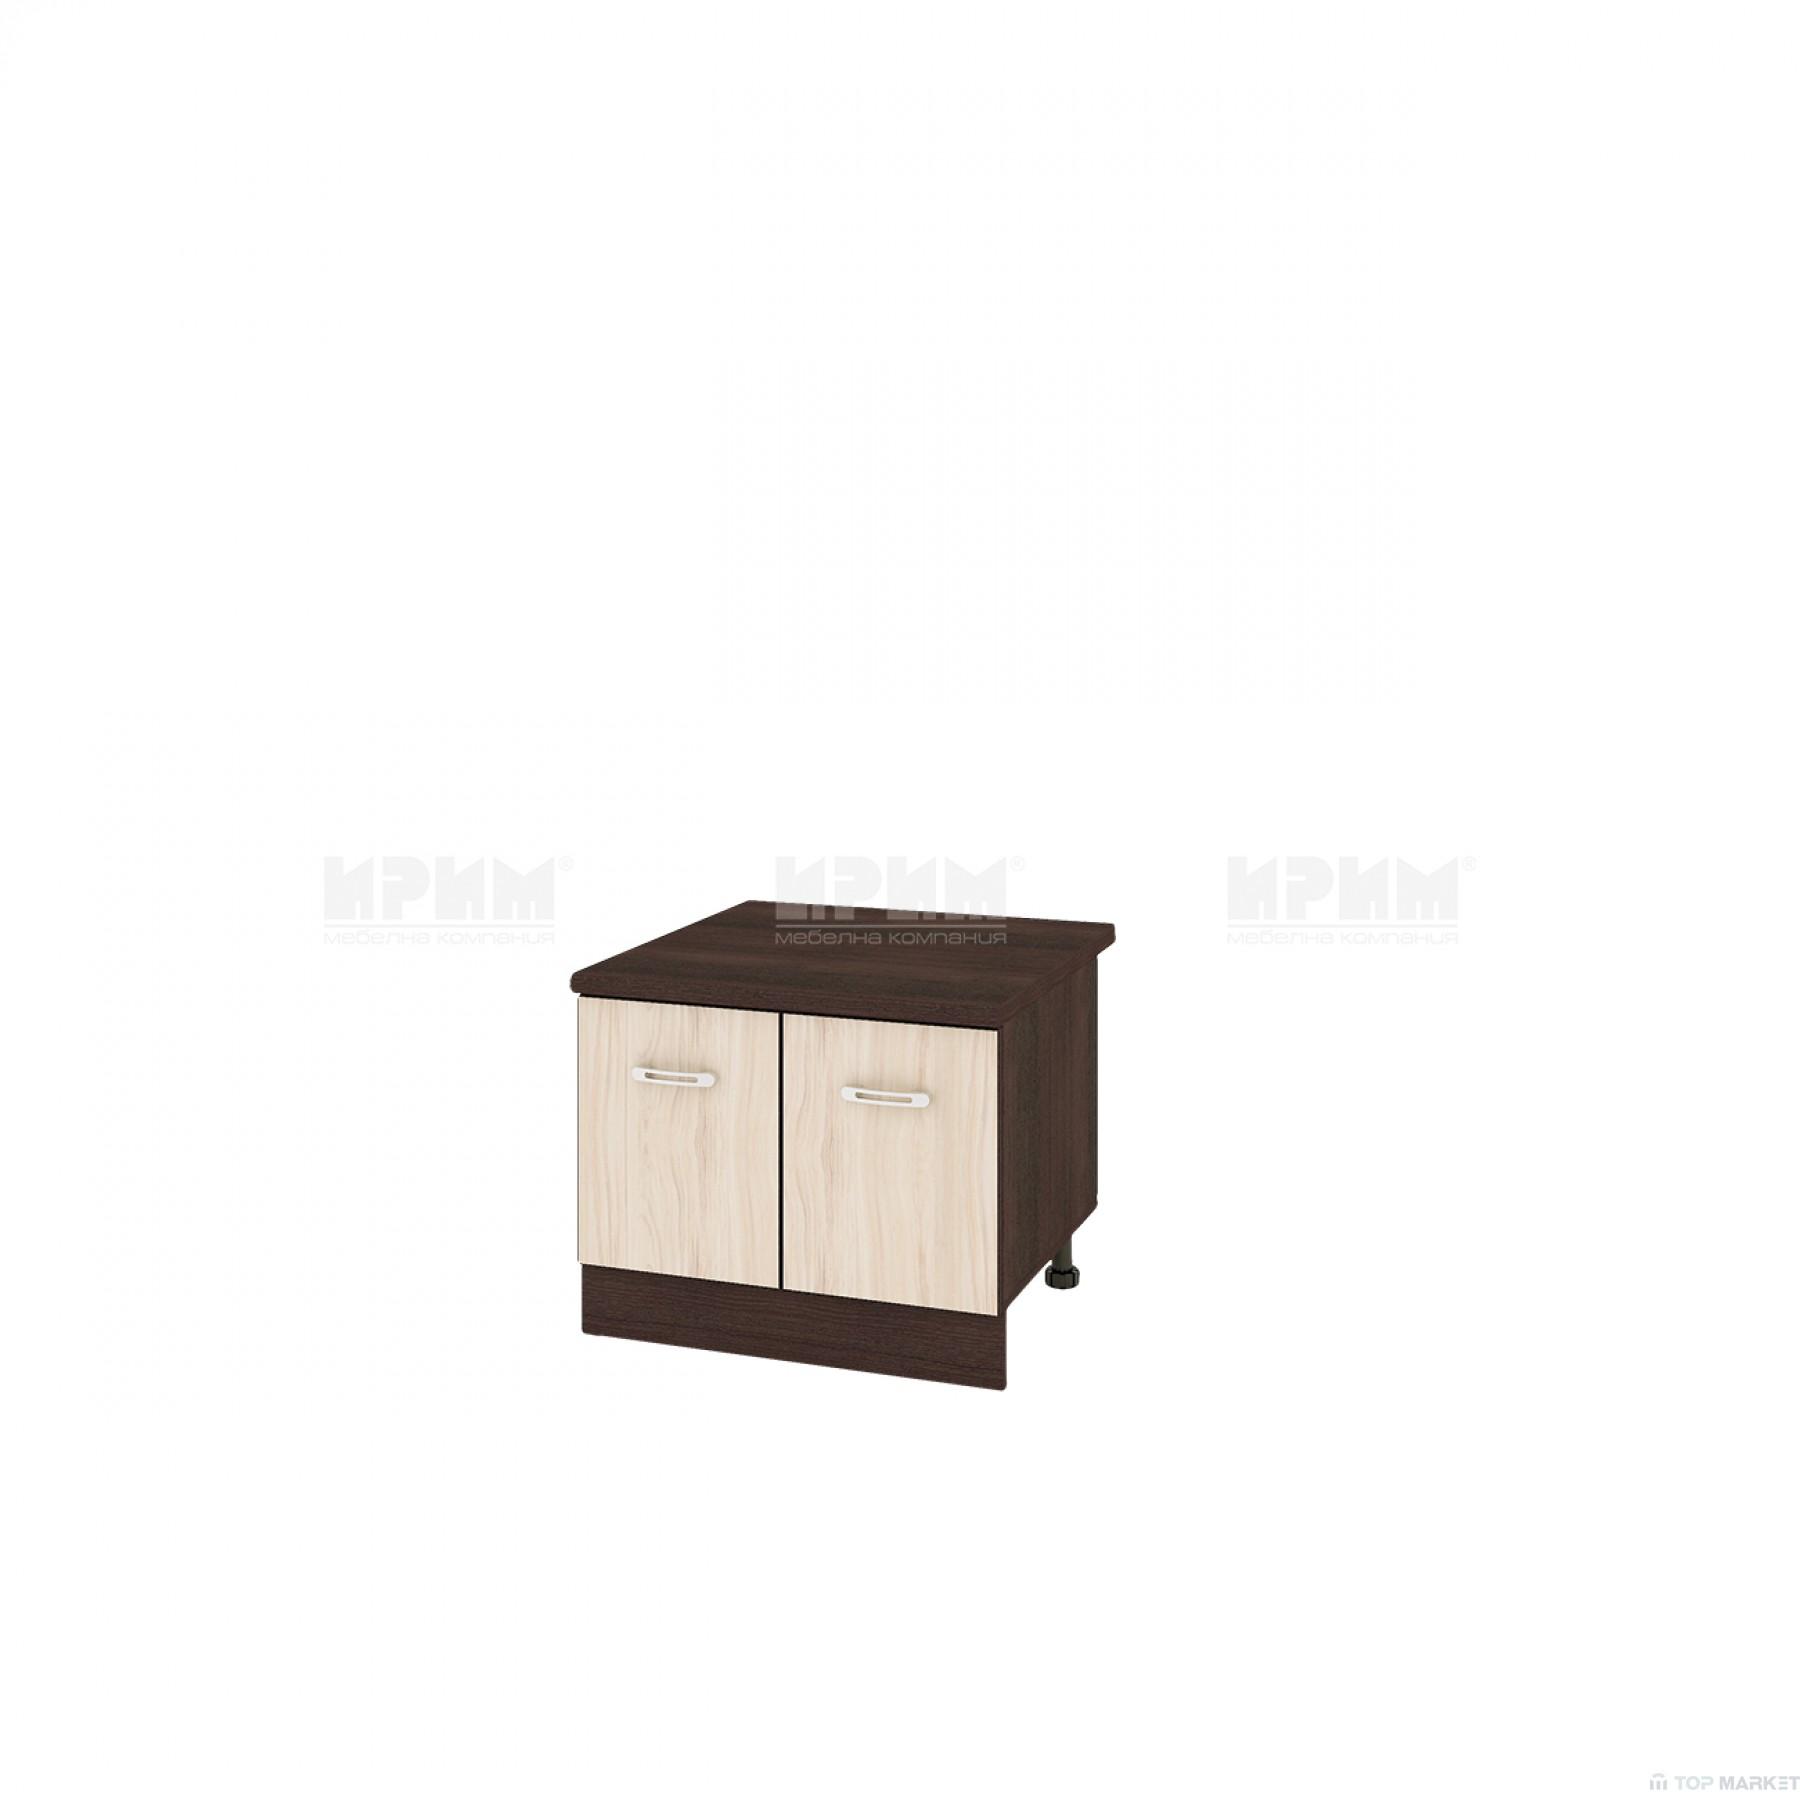 Долен шкаф за Раховец City ВА-32